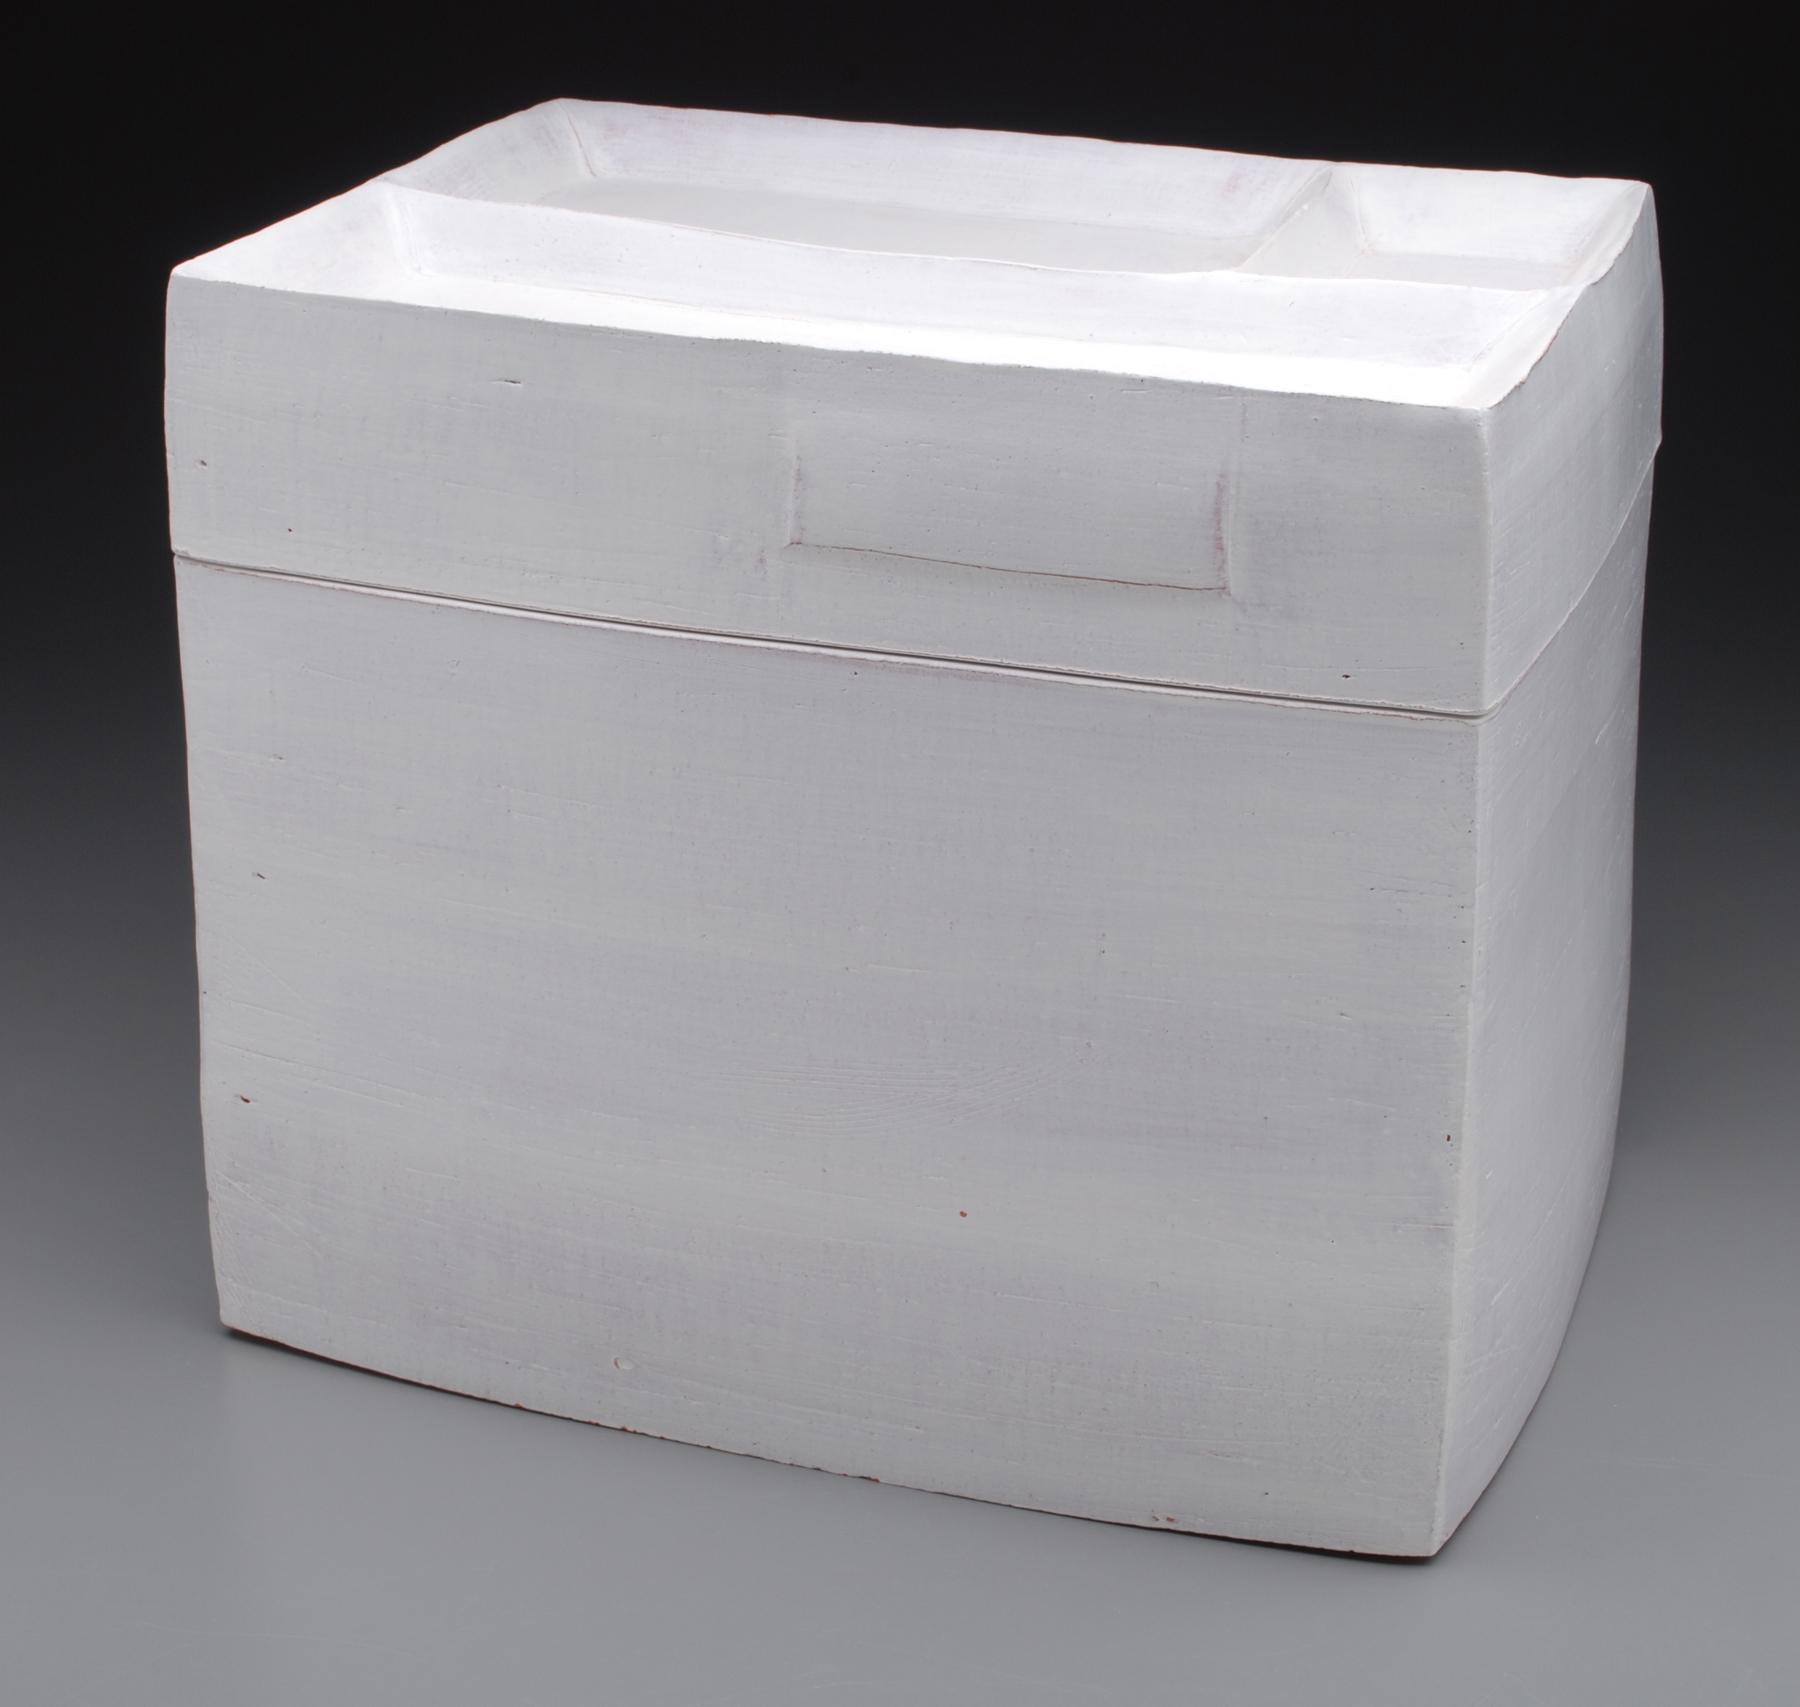 Eichelberger Large White Box.jpg